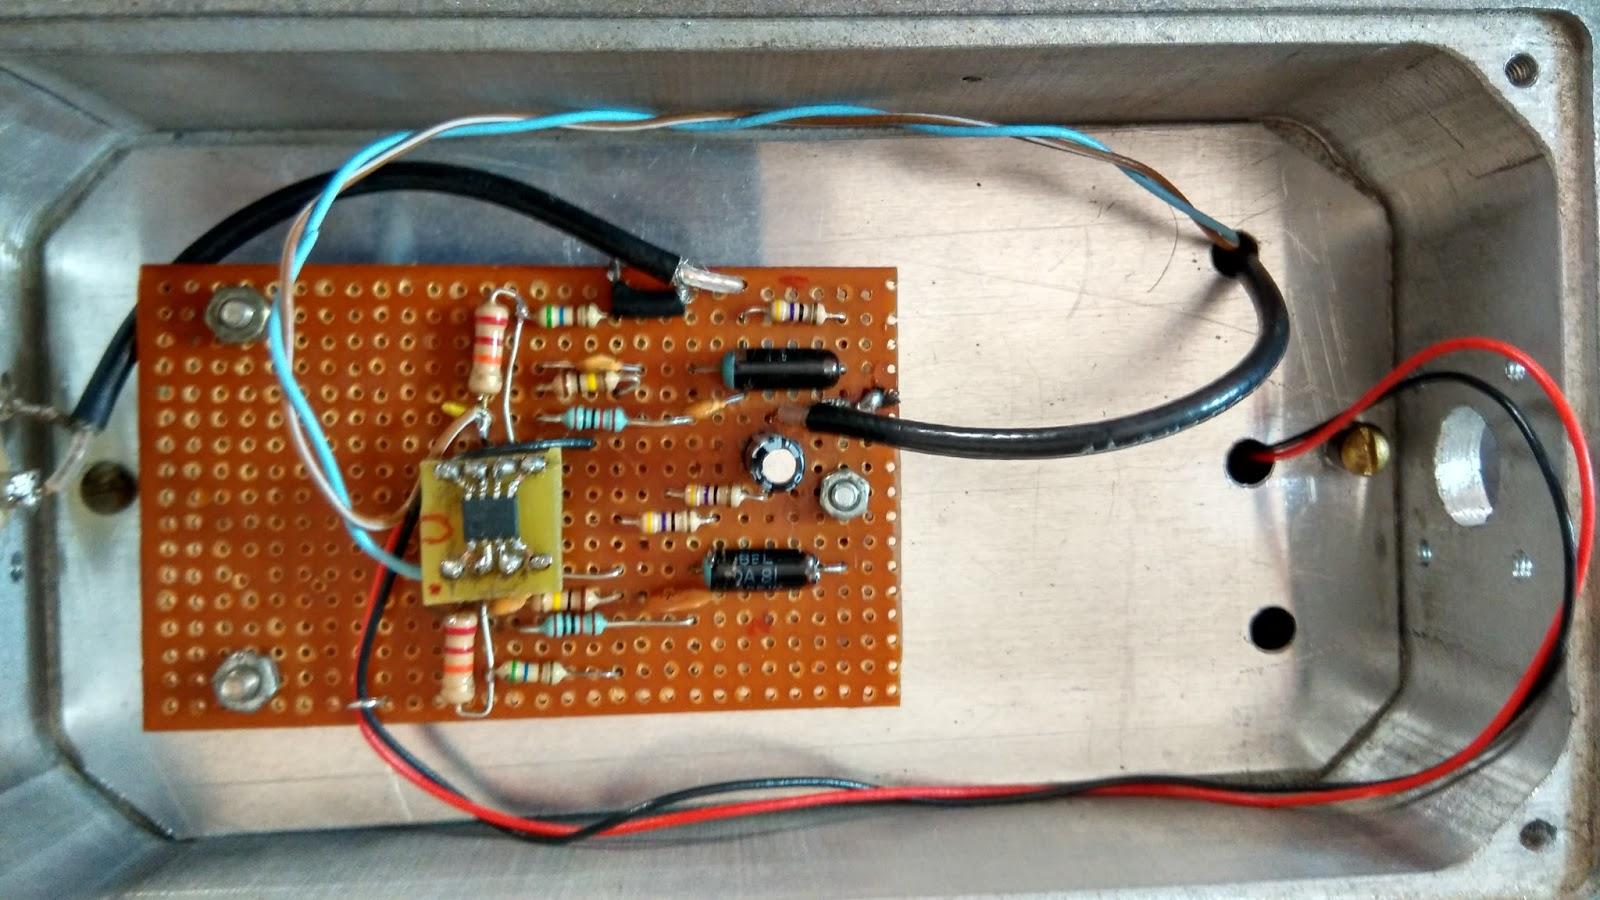 Vu2spfs Ex Vu3seg Ham Radio Page Simple Swr Power Meter Circuit Using 1n60 The Analog Side